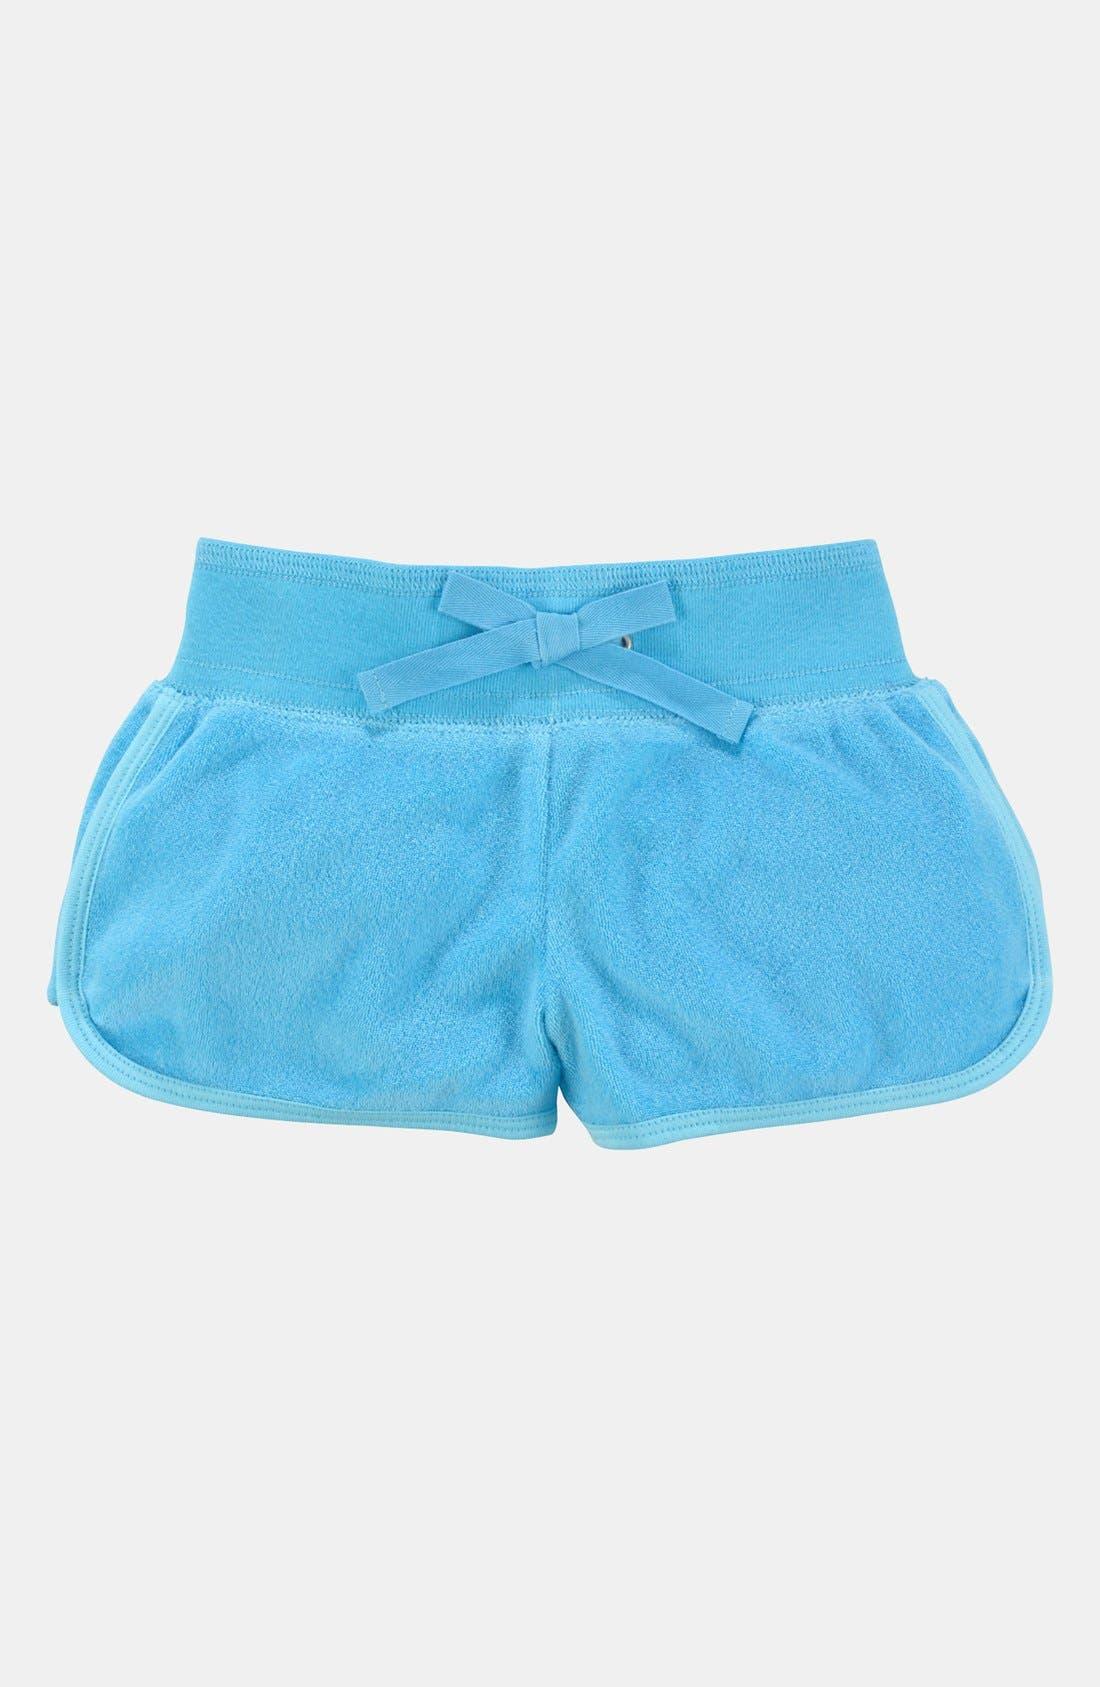 Main Image - Ralph Lauren Terry Cloth Shorts (Toddler)